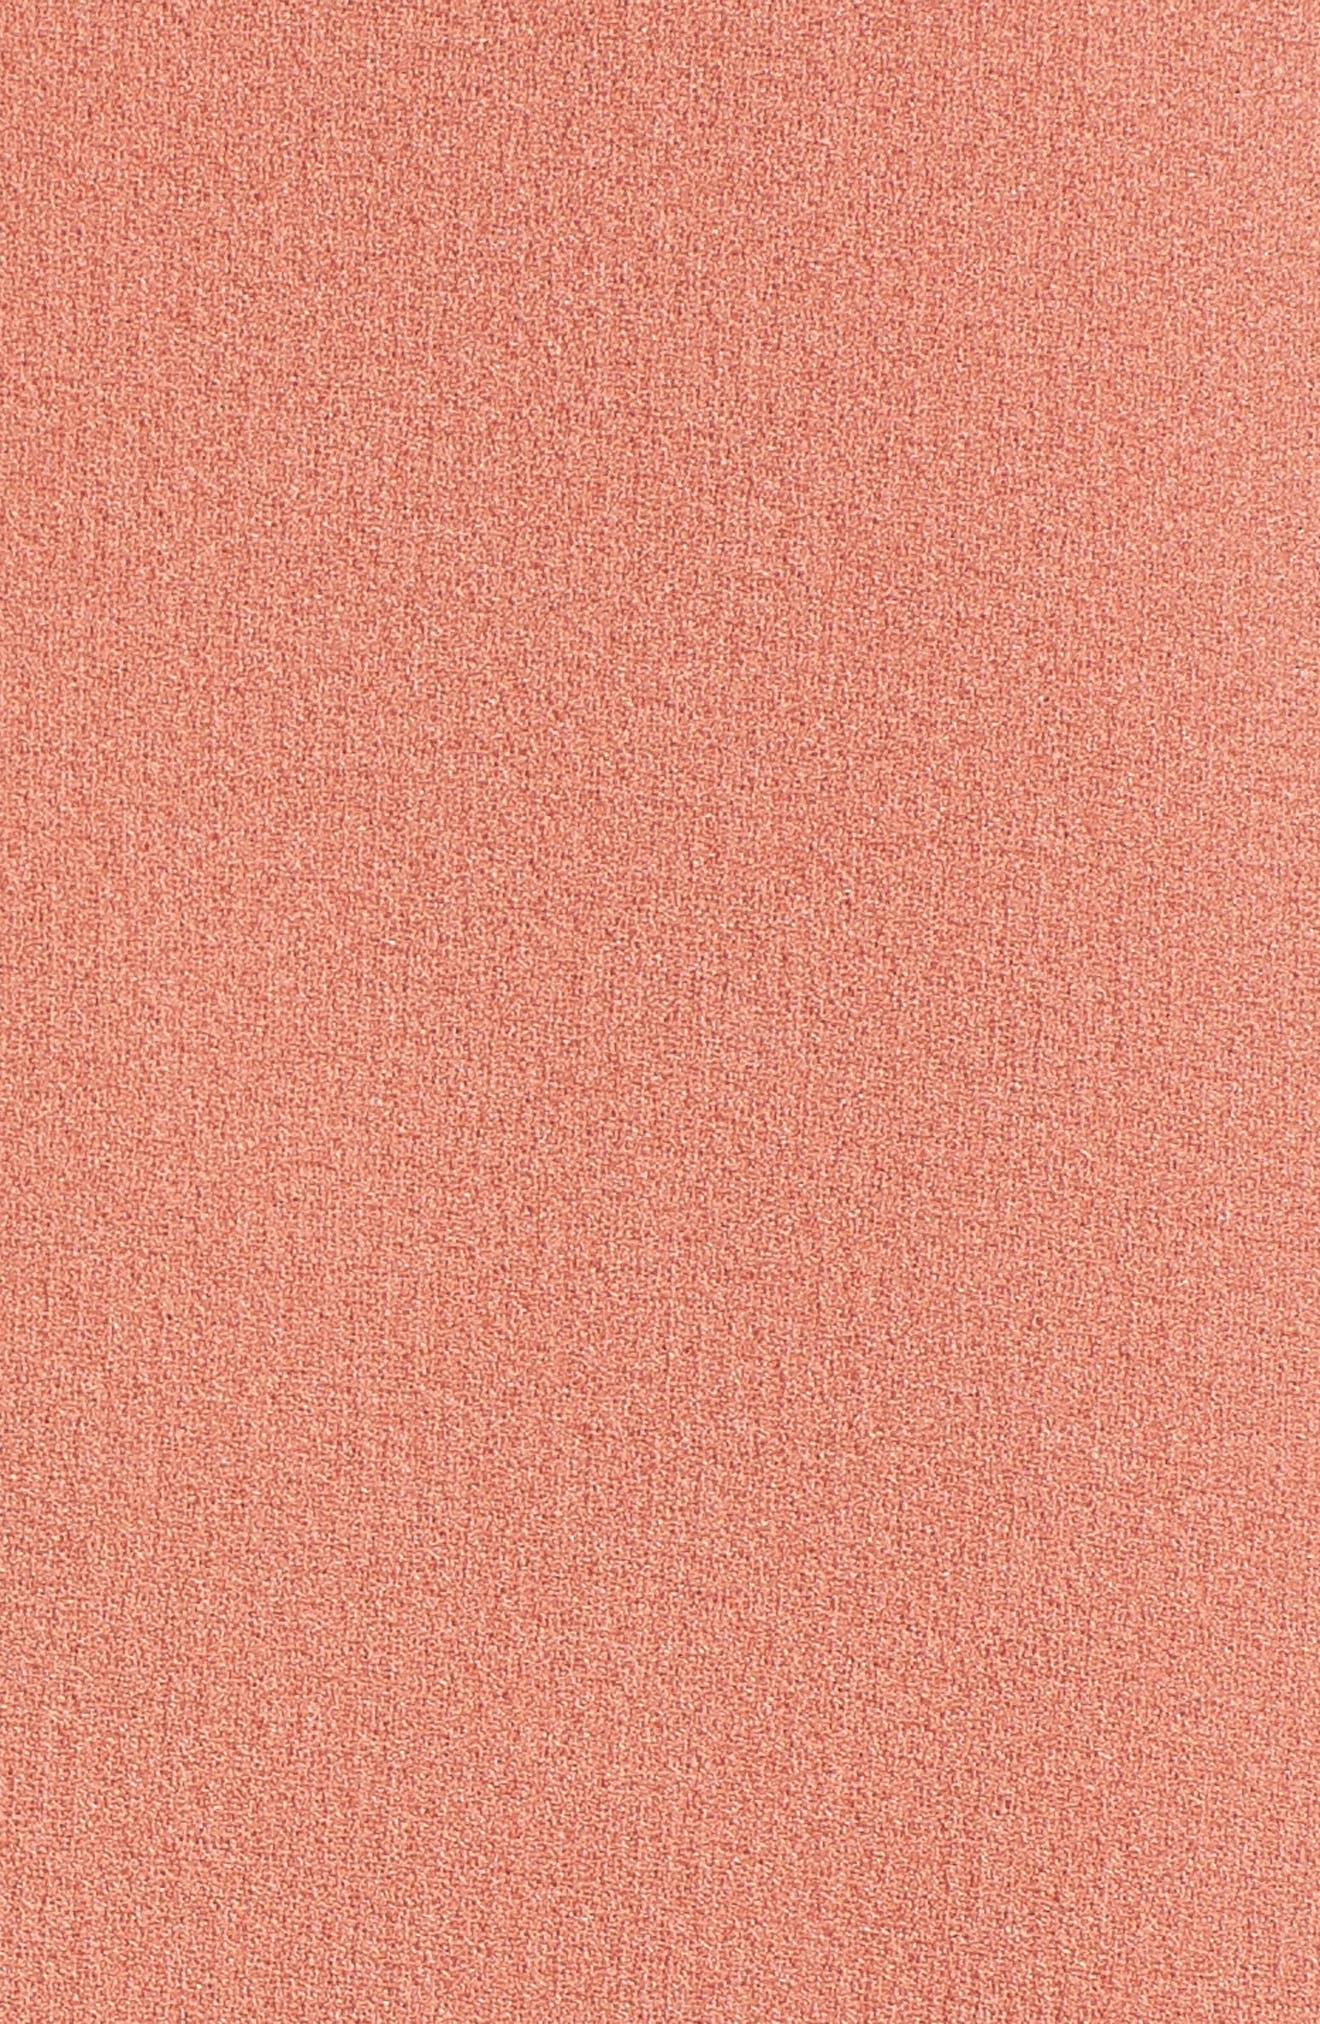 Hailey Crepe Dress,                             Alternate thumbnail 141, color,